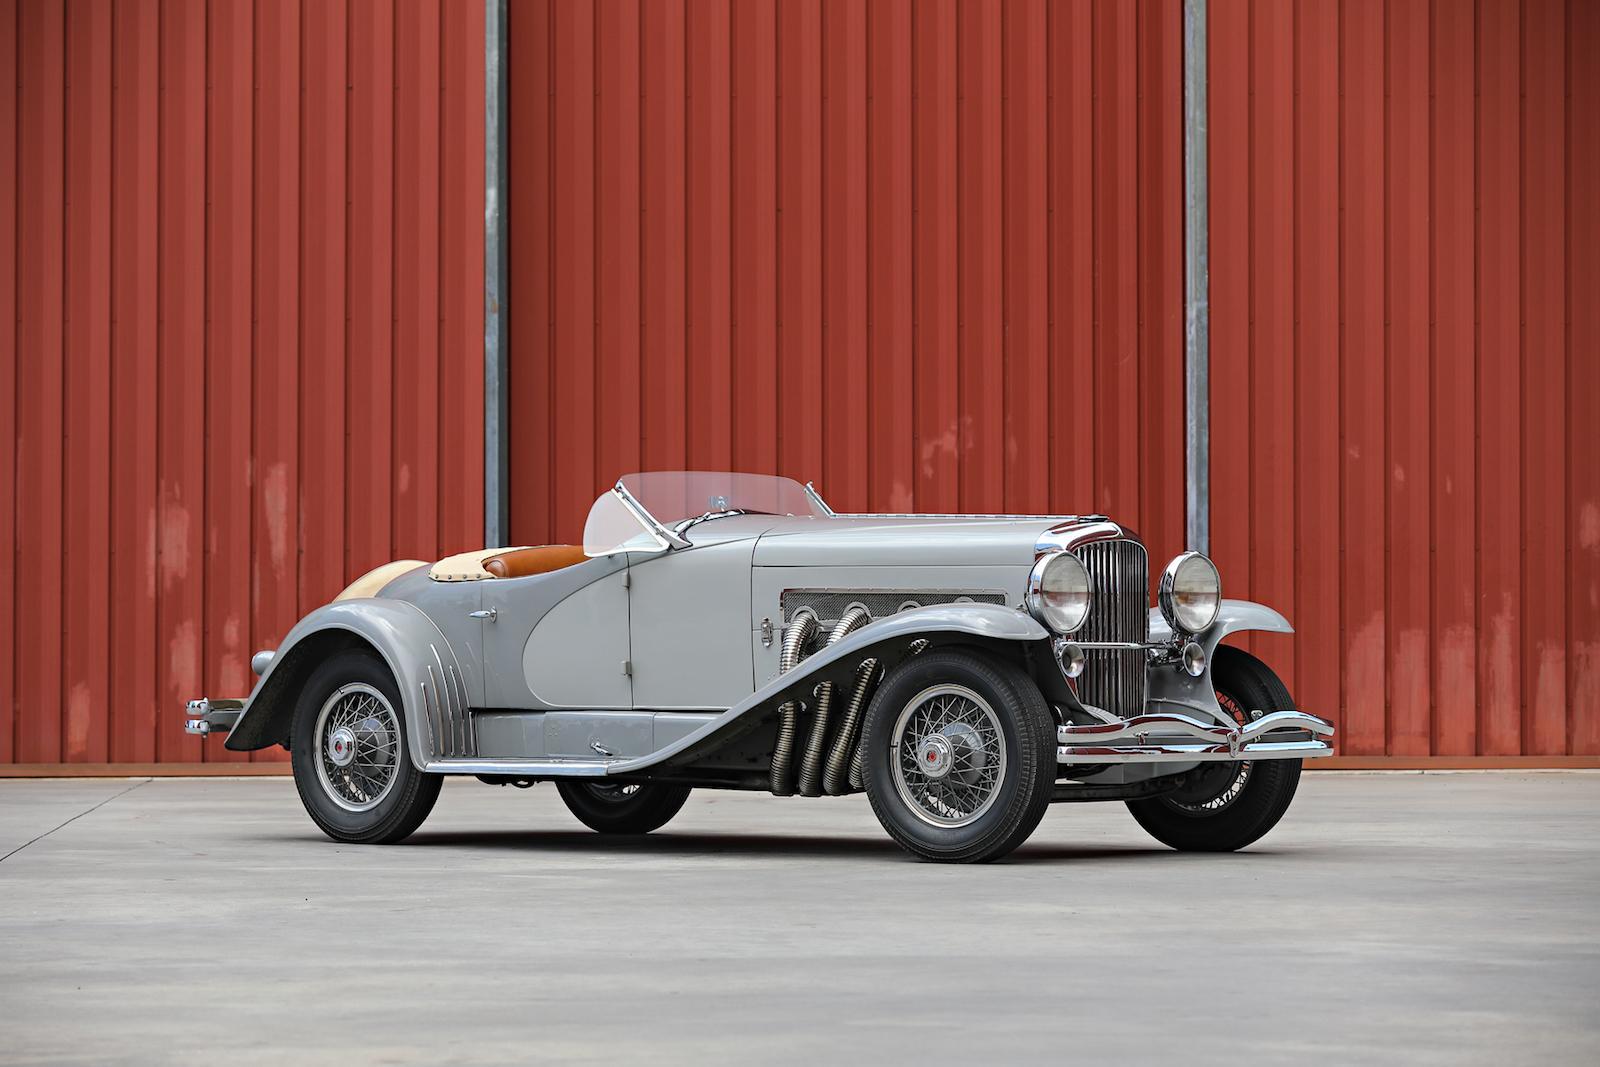 1935 duesenberg ssj becomes most expensive american car ever sold at auction autoevolution. Black Bedroom Furniture Sets. Home Design Ideas